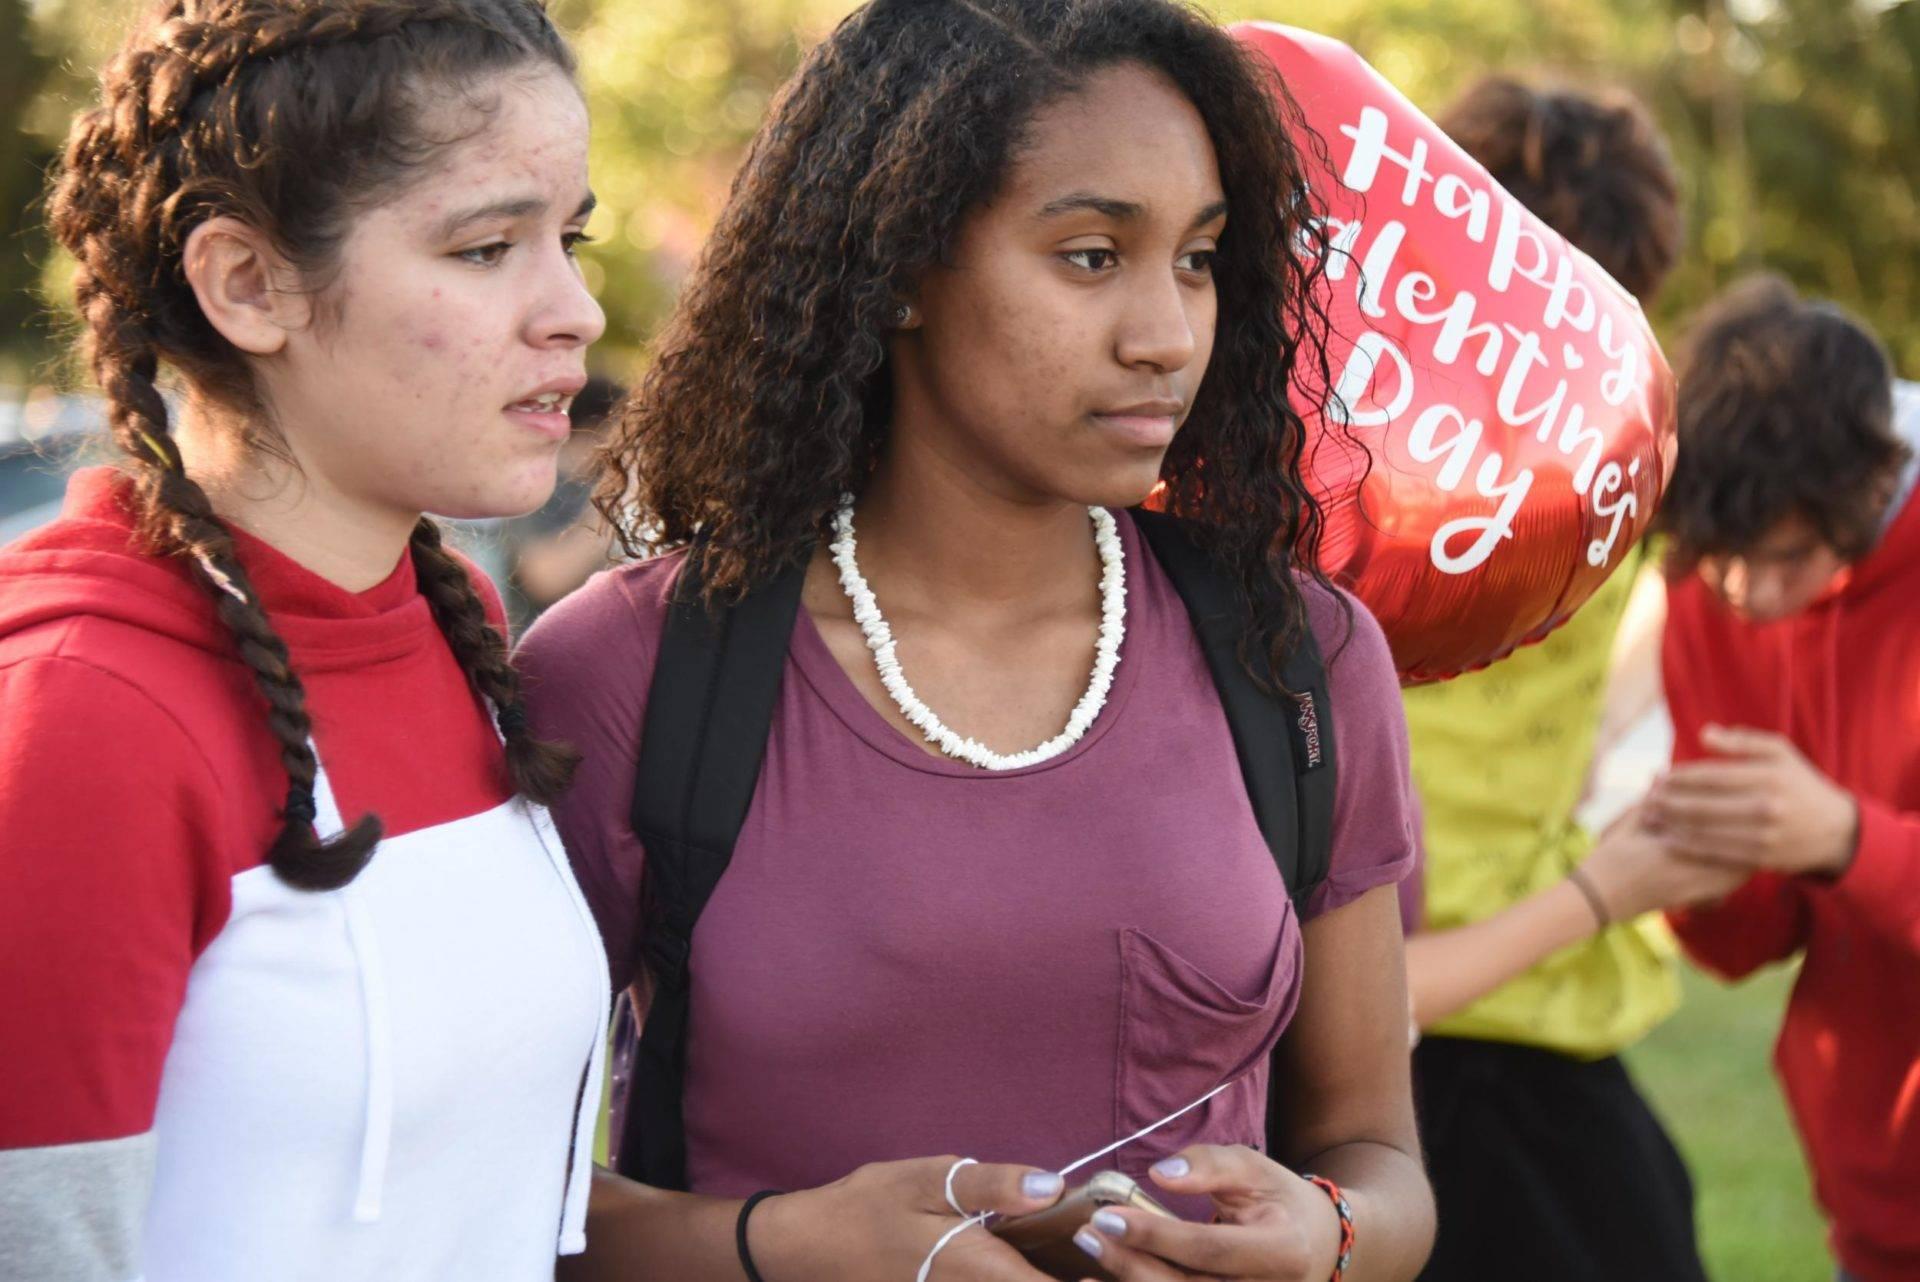 school shooting in Parkland, Florida kills 17